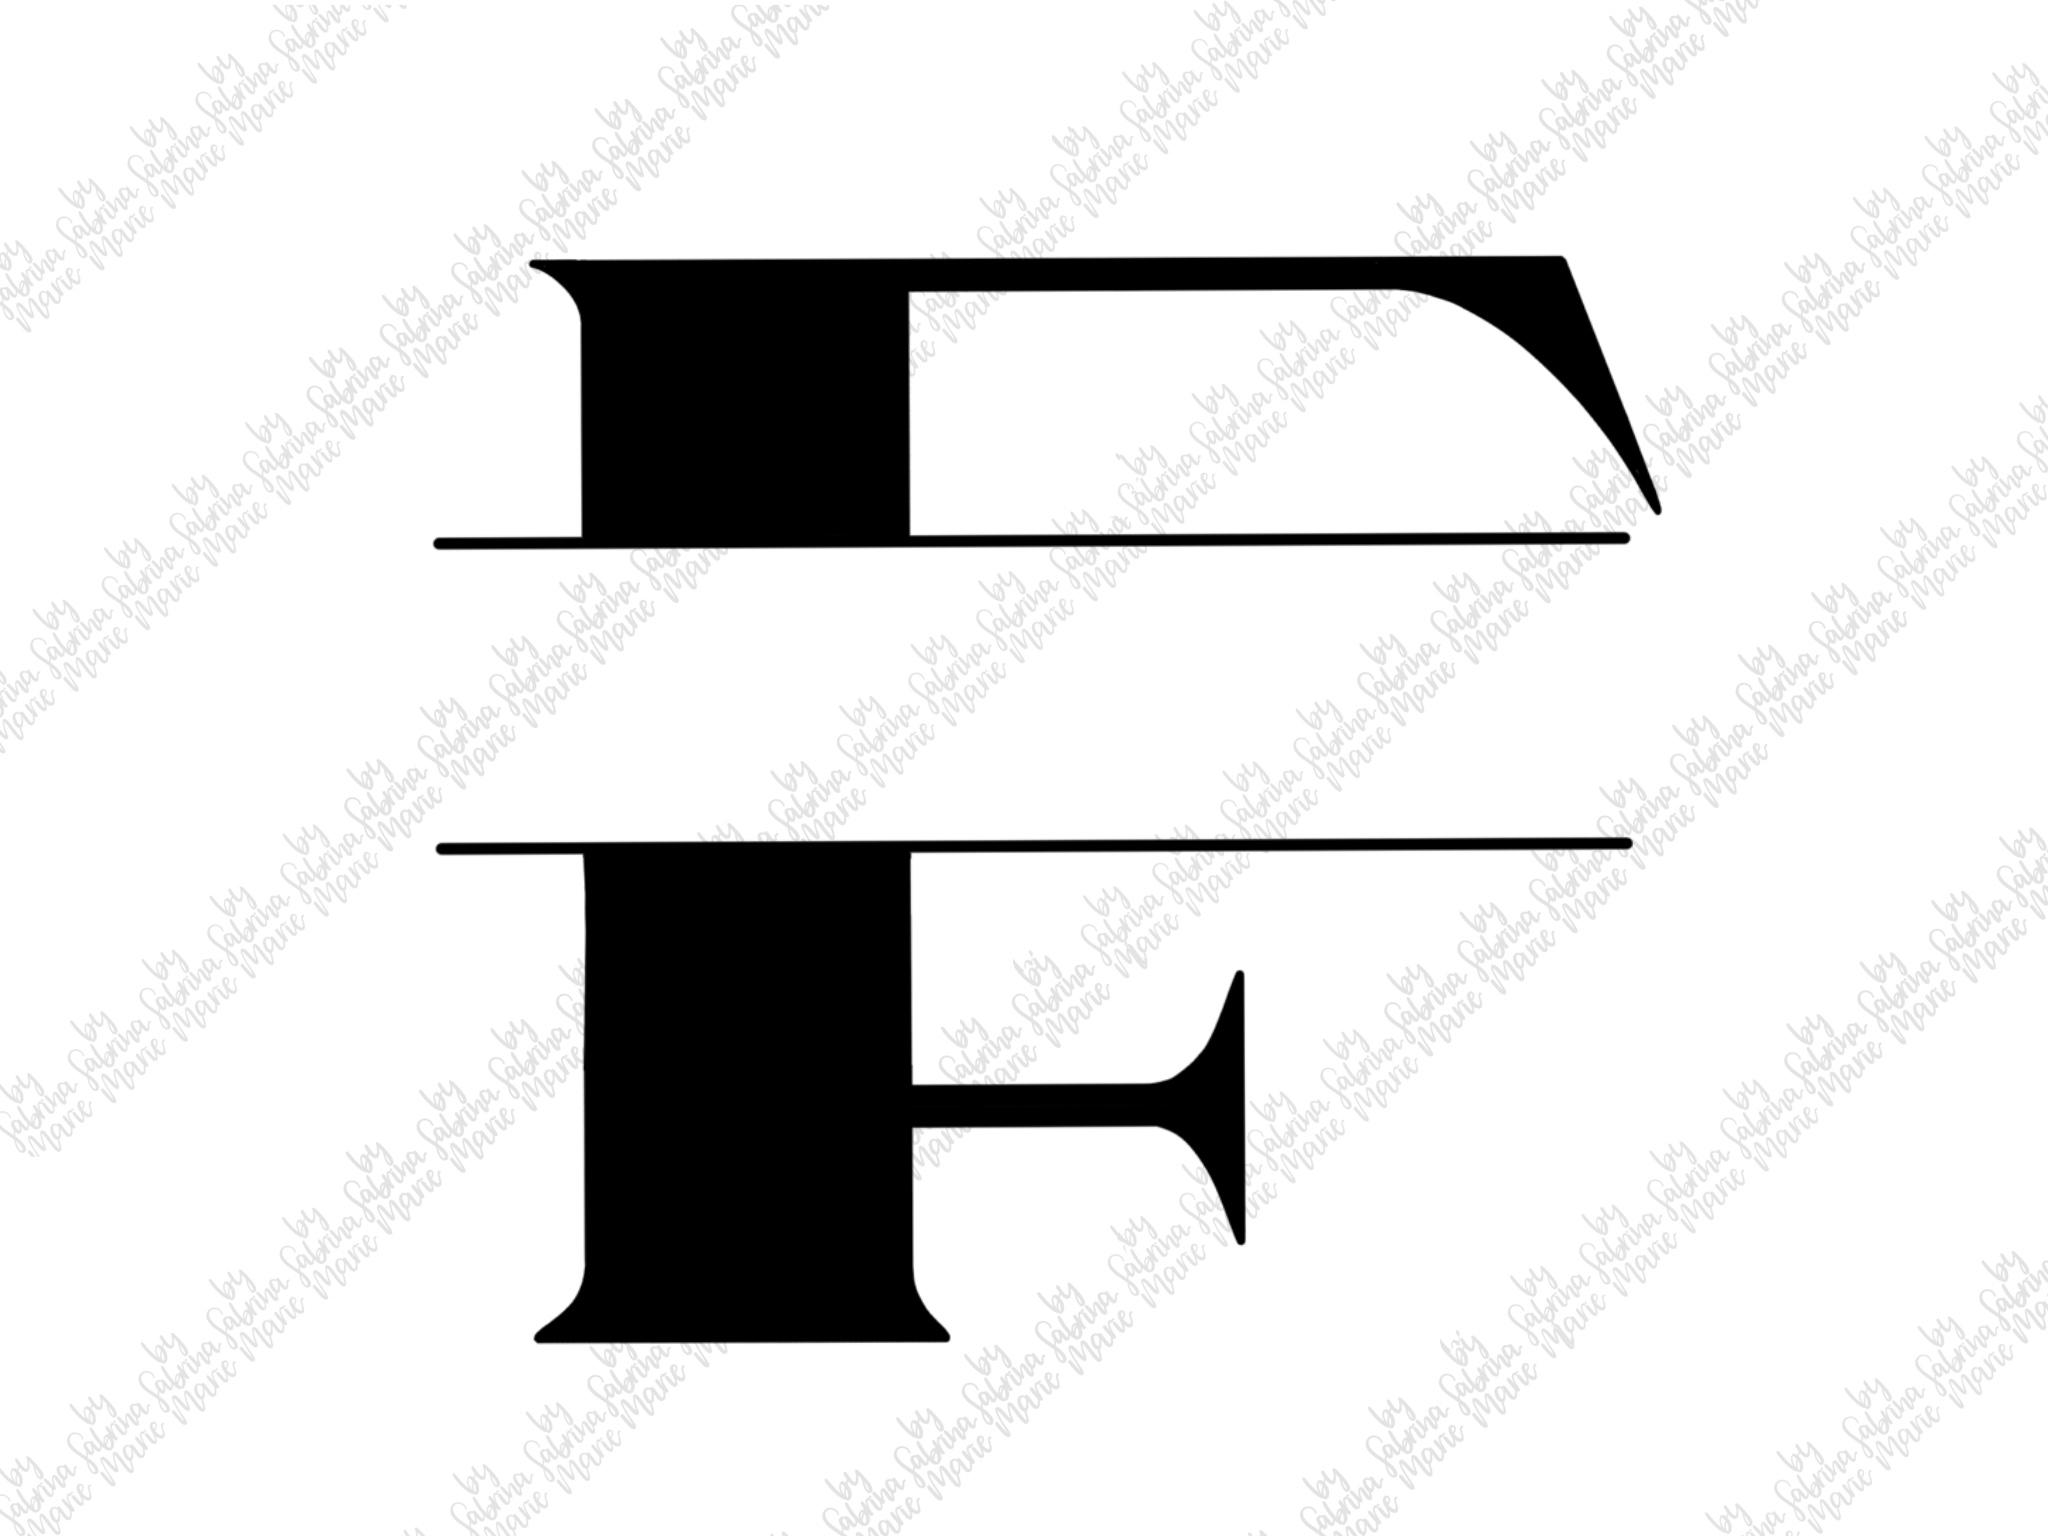 Split Monogram F - Handdrawn - SVG/PNG example image 2